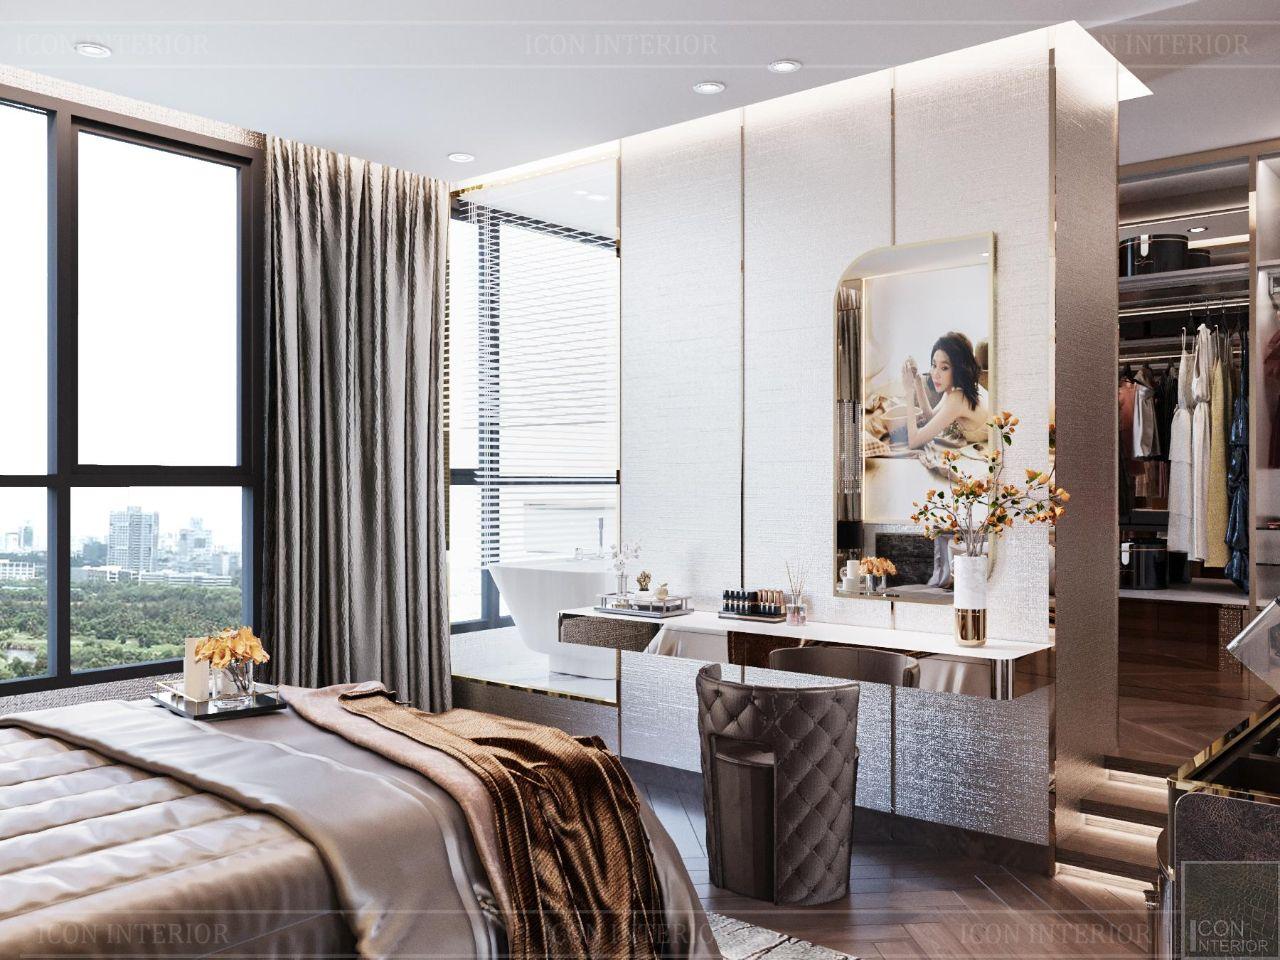 thiết kế căn hộ Vinhomes Central Park 90m2 Ms. Linh